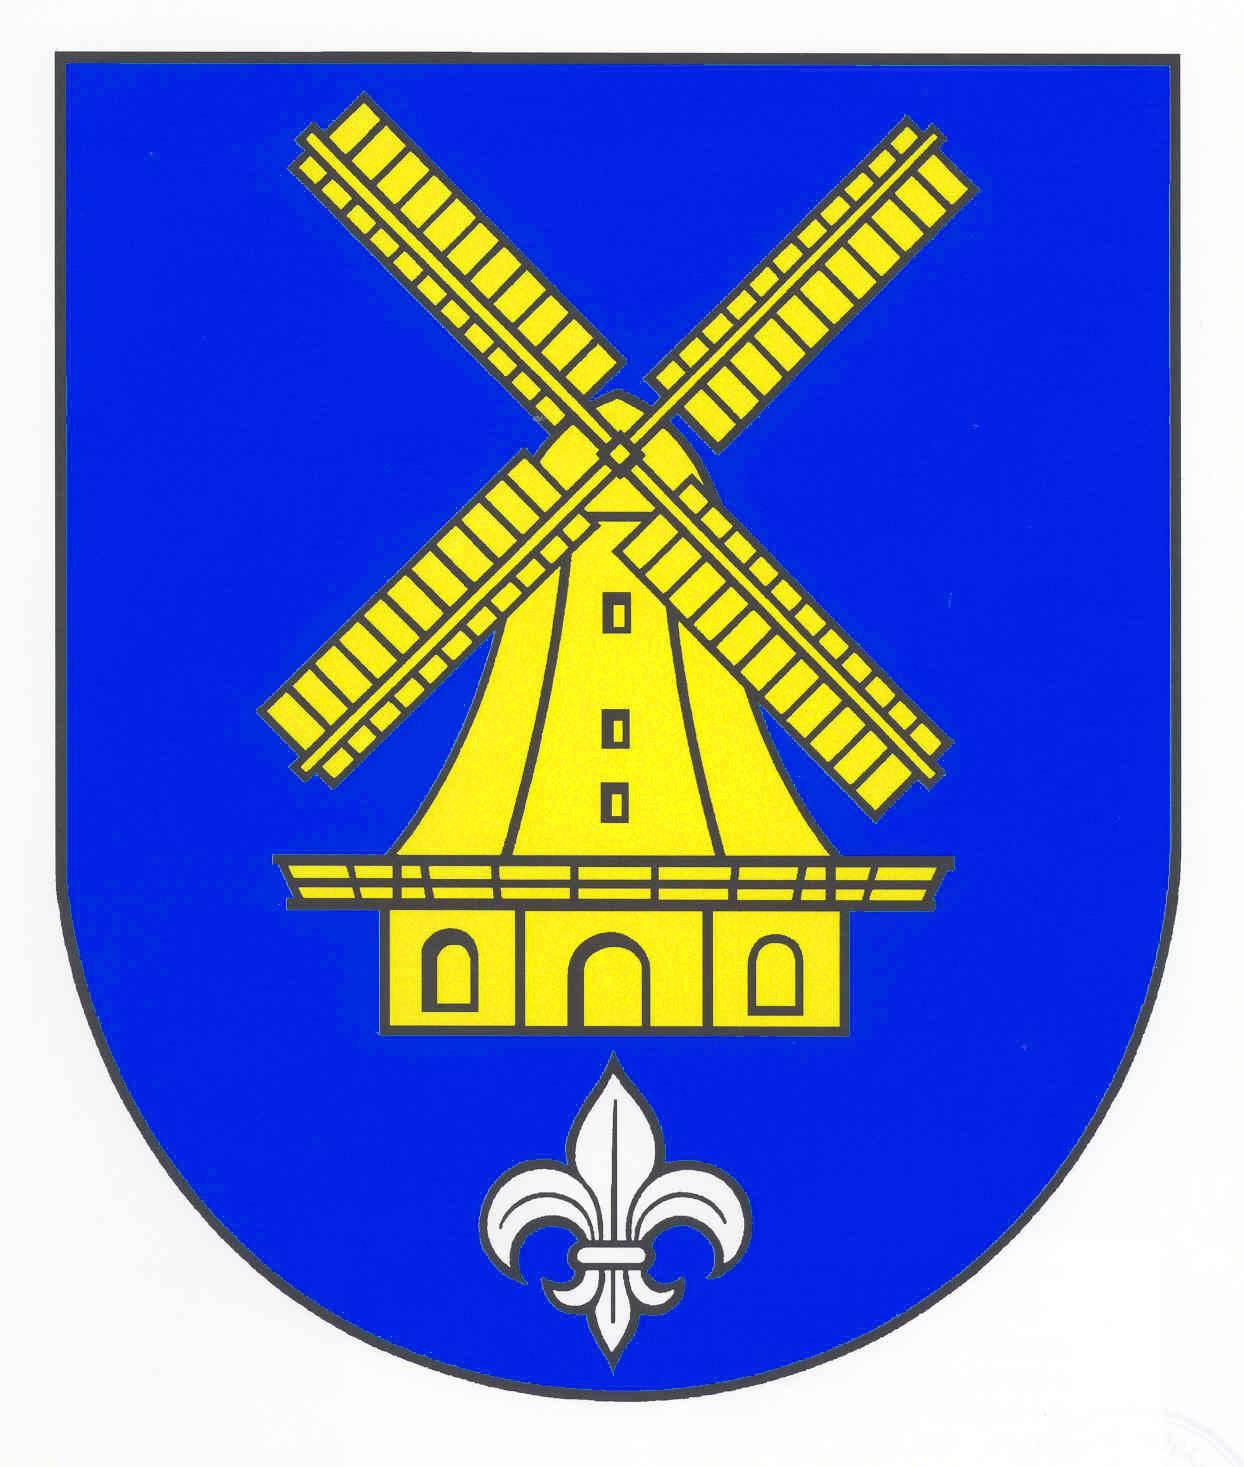 Wappen GemeindeSchashagen, Kreis Ostholstein